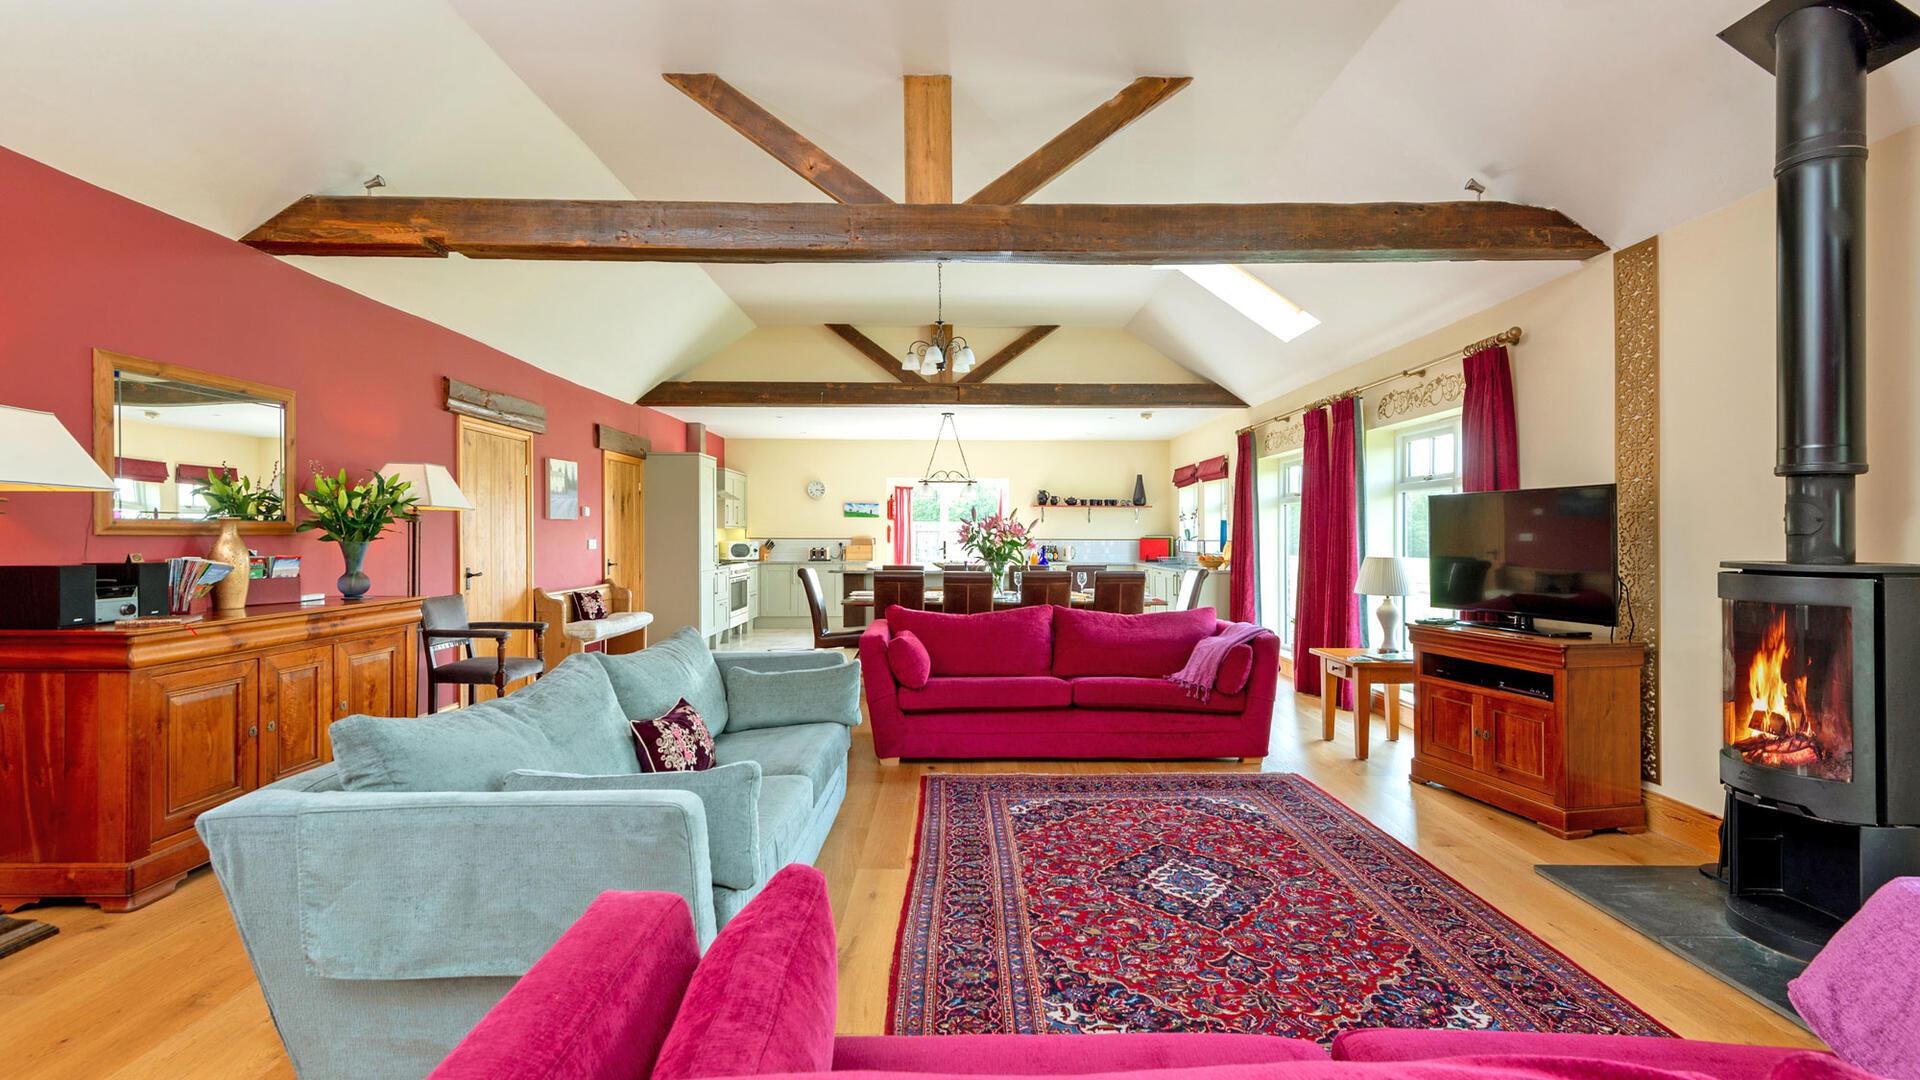 4 Bedroom Cottage/shared grounds in Yorkshire, United Kingdom